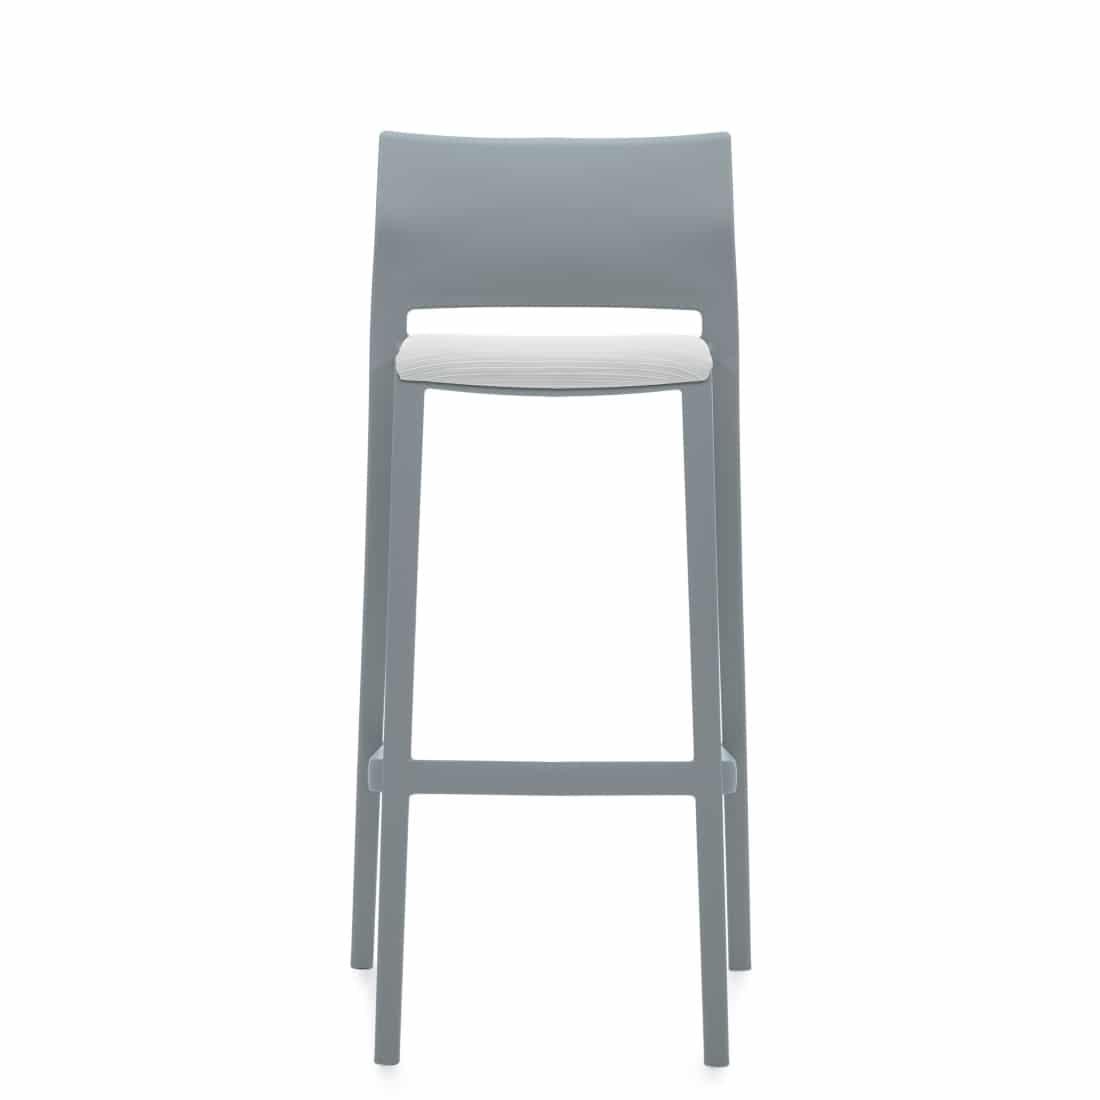 Armless Bar Stool, White Upholstered Seat & Grey Polymer Back (6755)